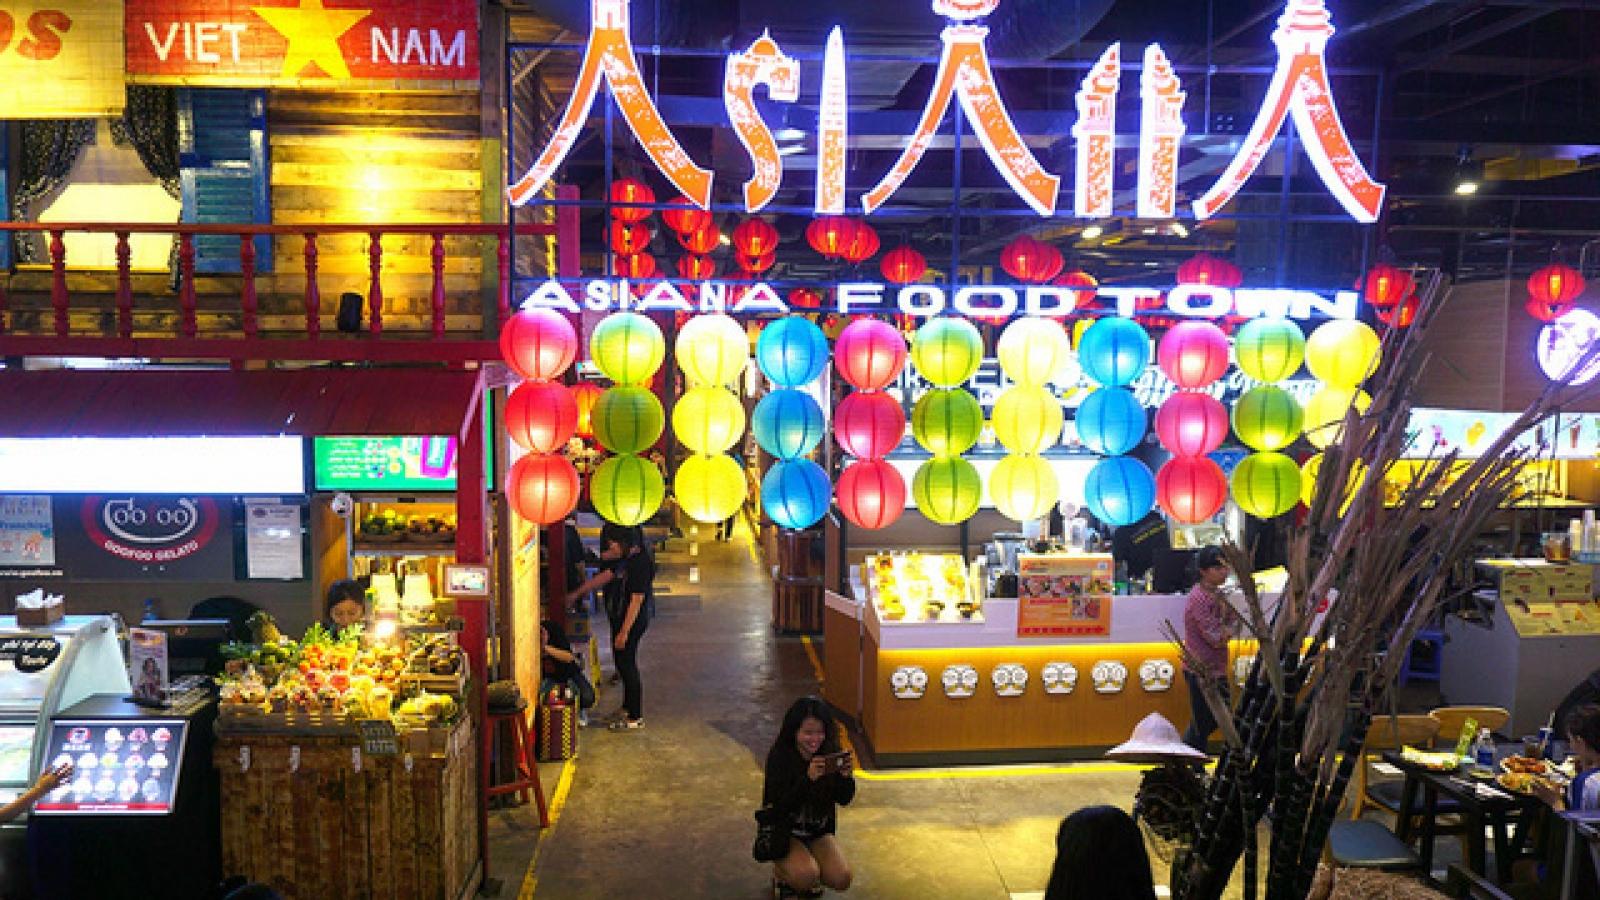 Saigon's underground parking lot transformed into busy market